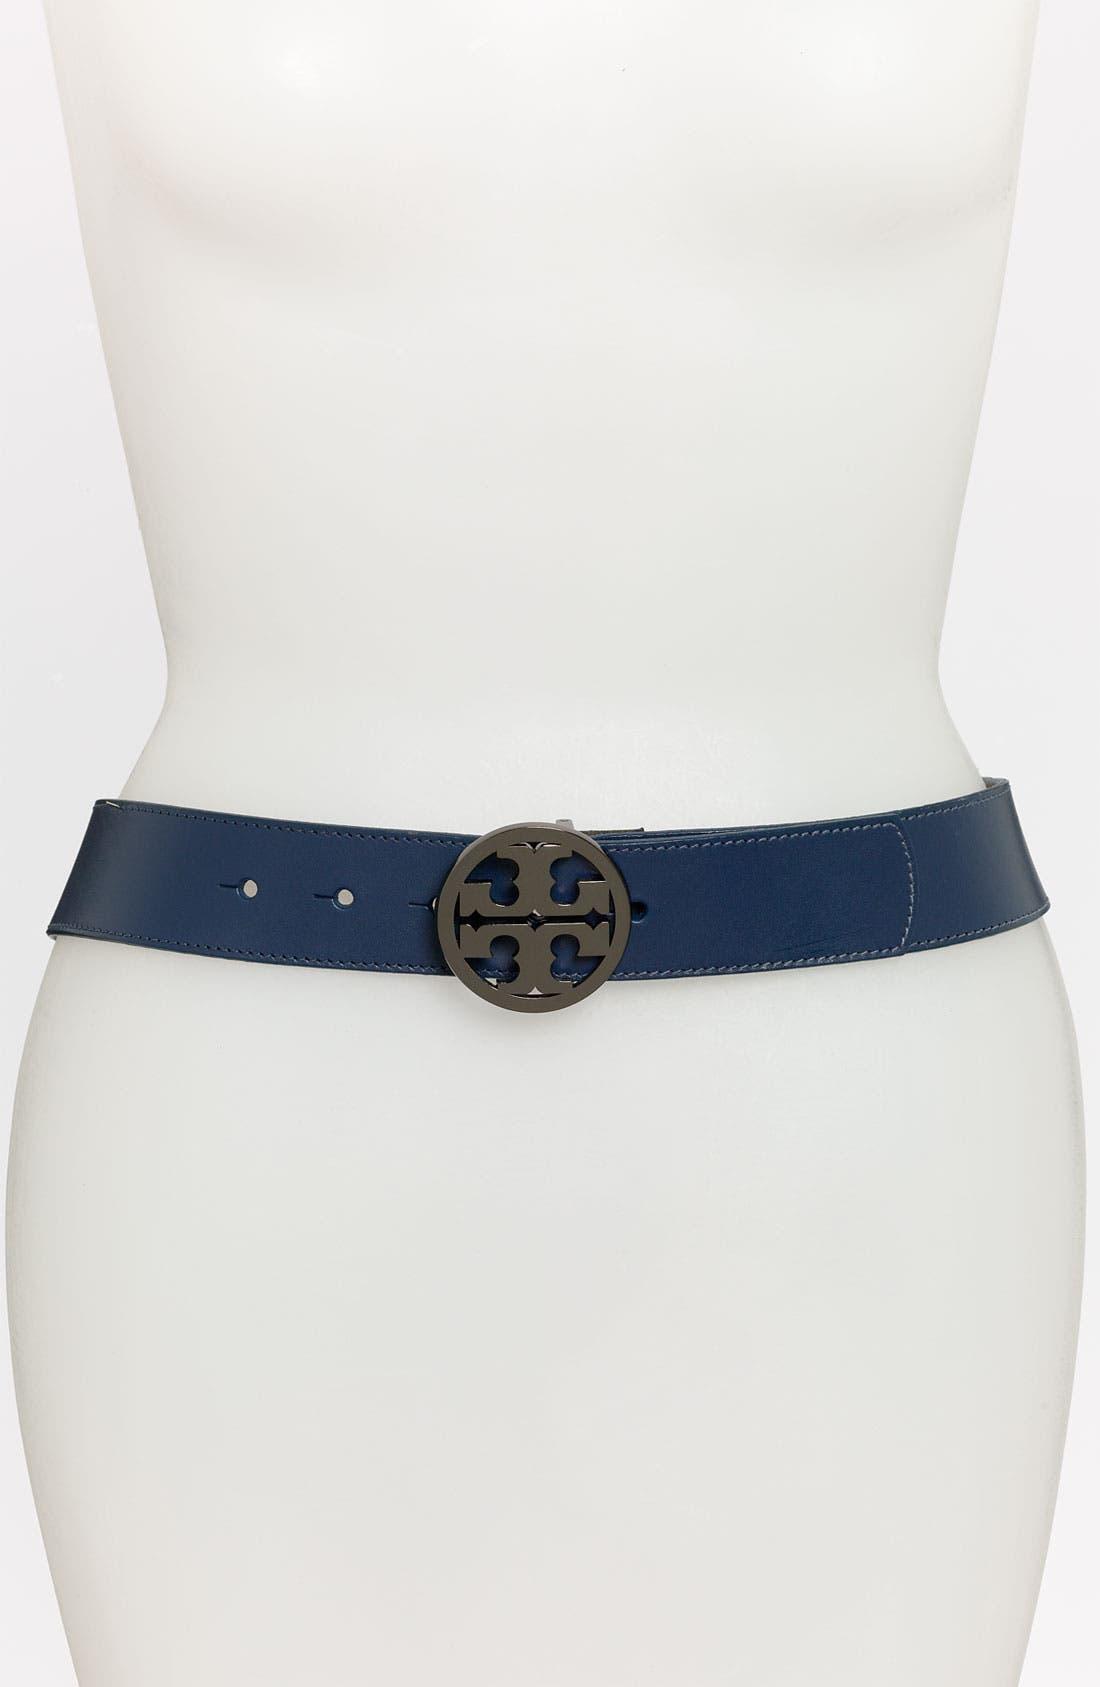 Main Image - Tory Burch 'Robinson' Logo Belt